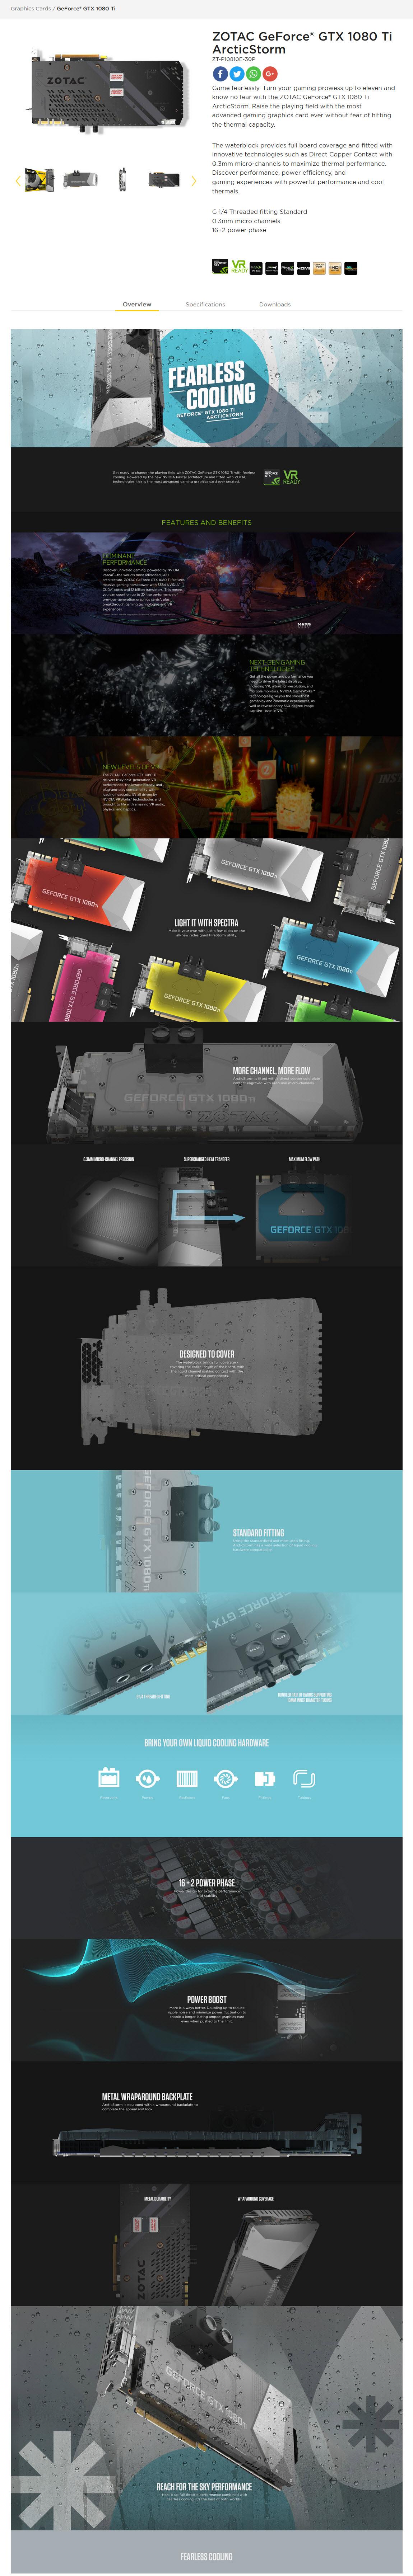 2017 09 20 19 31 00 ZOTAC GeForce® GTX 1080 Ti ArcticStorm Review